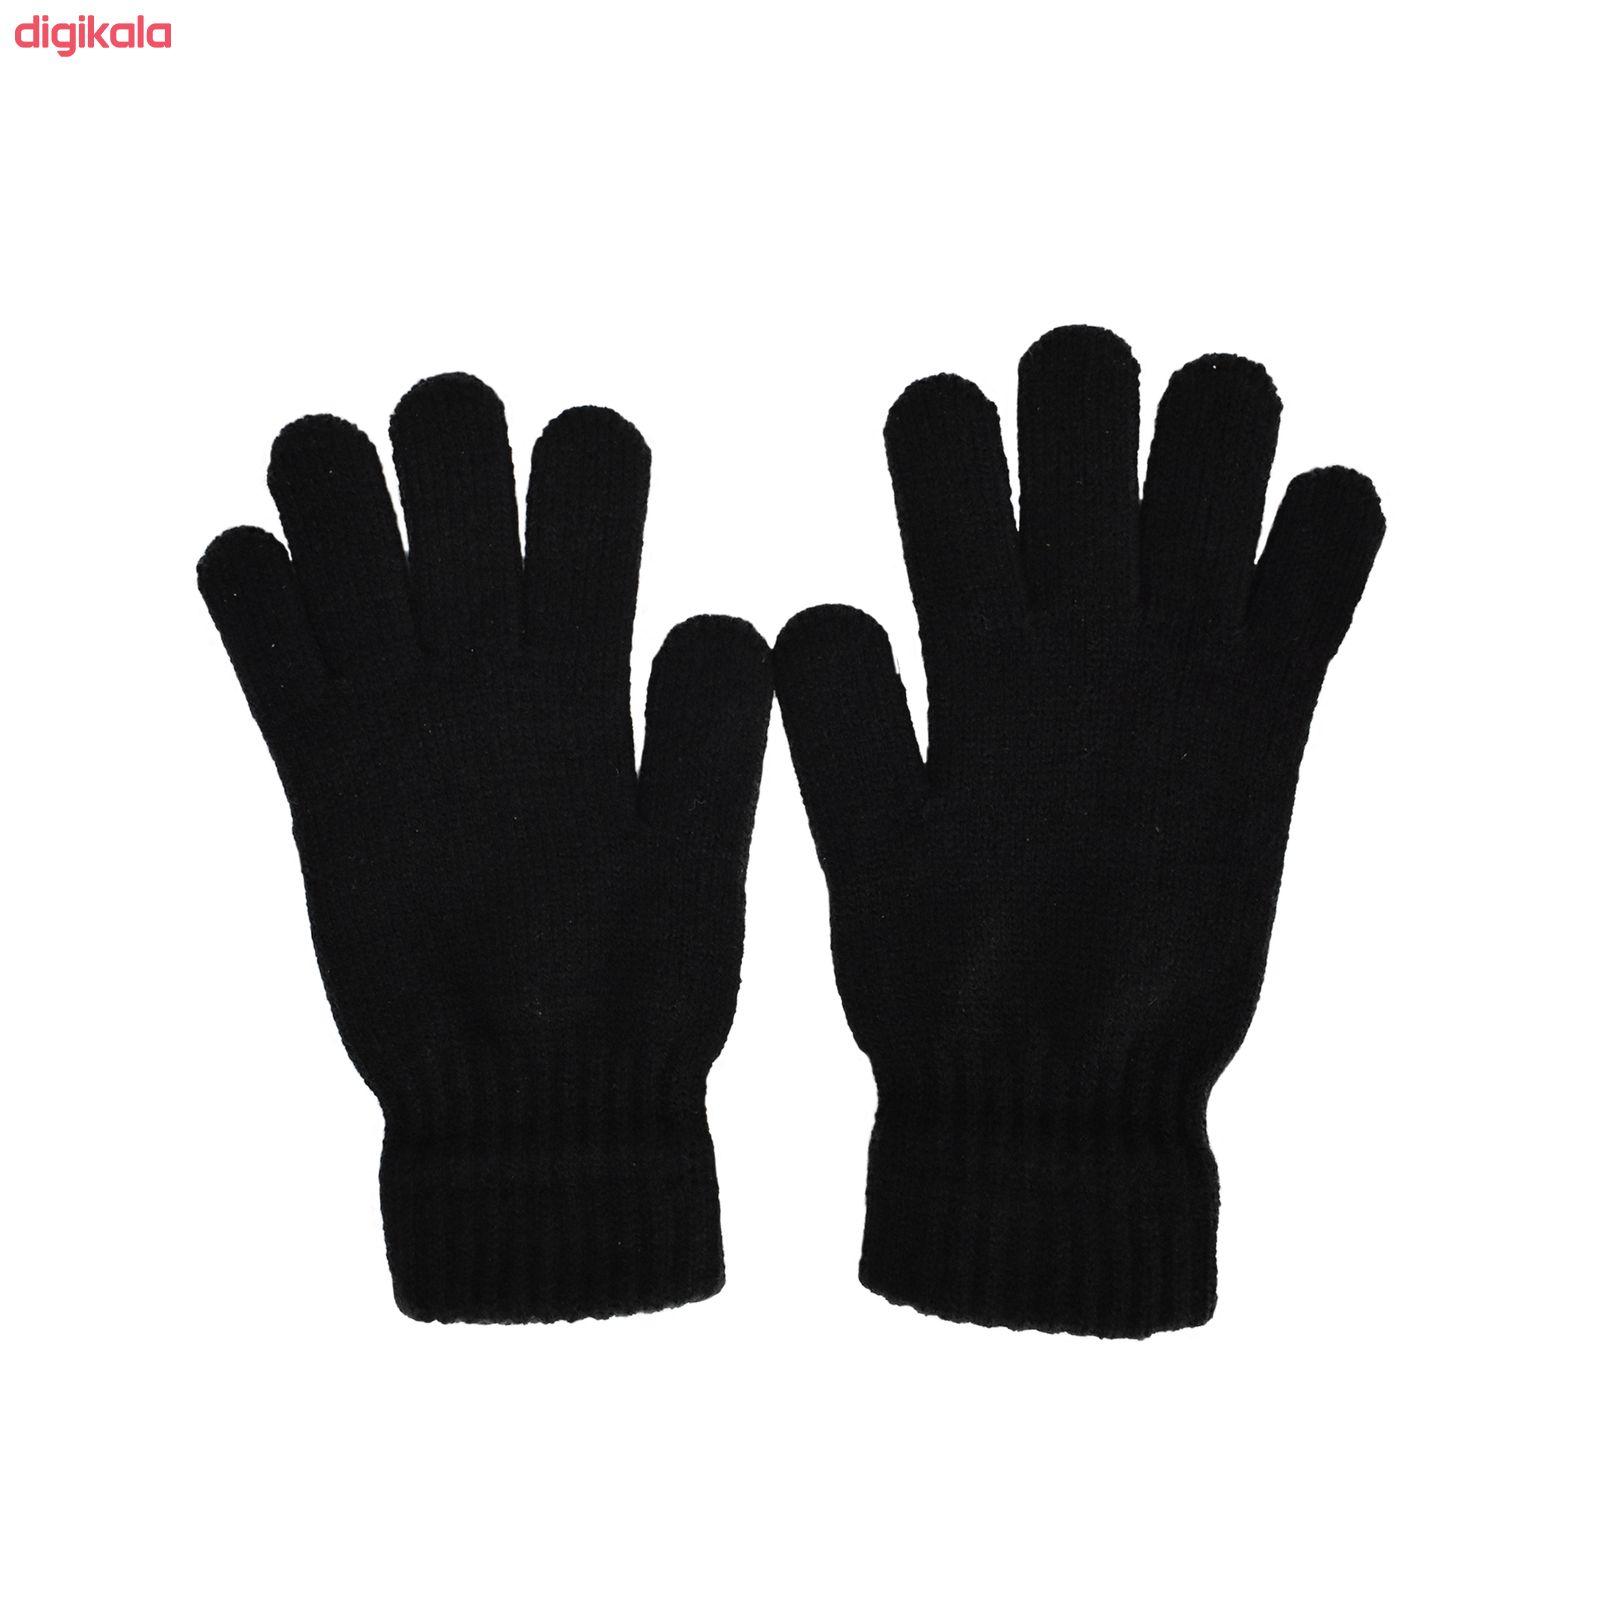 دستکش بافتنی تولیدی منوچهری کد uit56 main 1 2